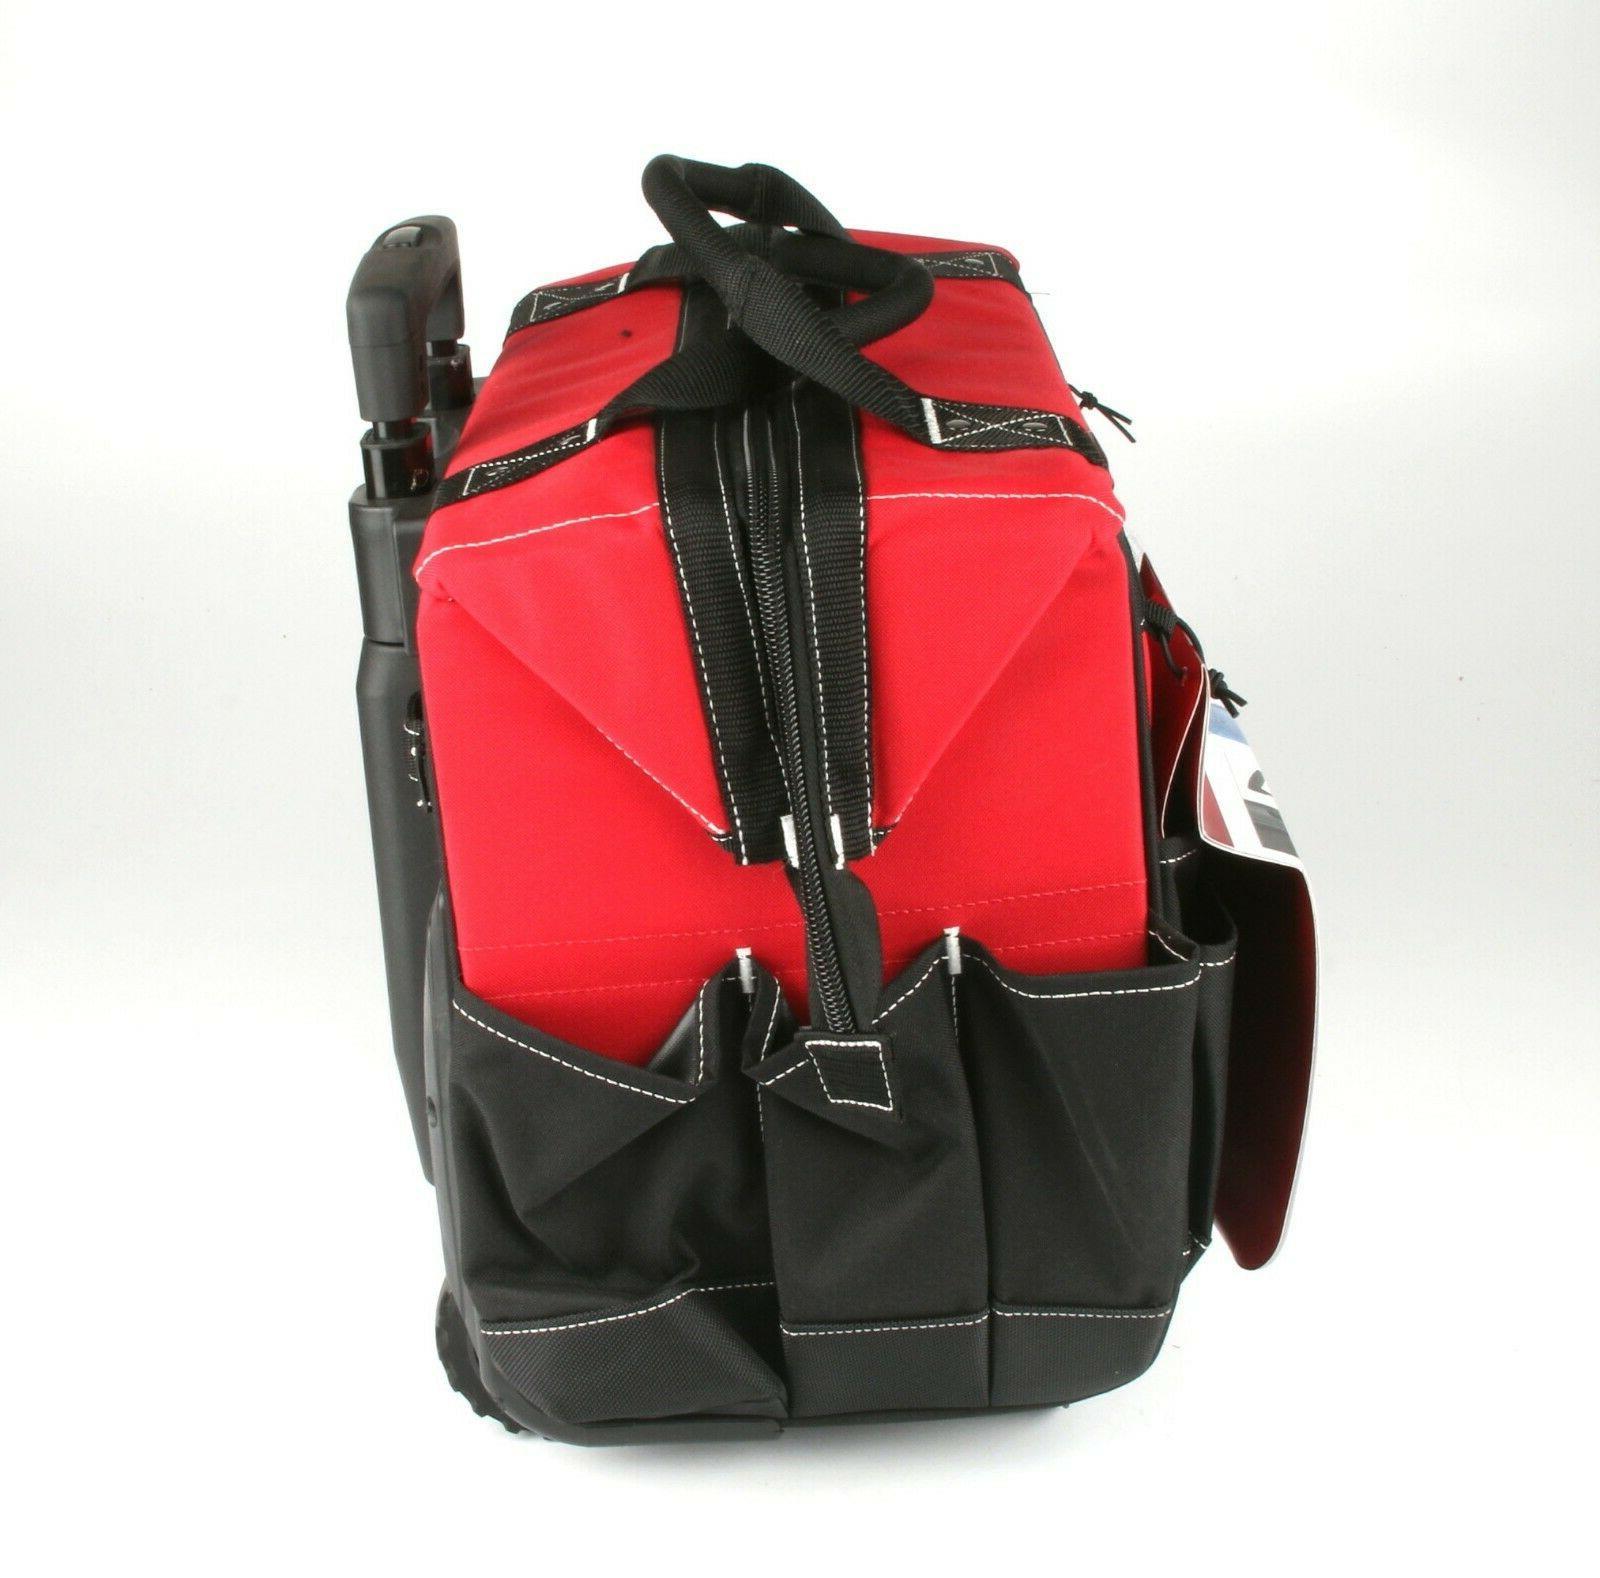 *HUSKY 18 in. Rolling Tool Bag w. Telescopic Handle